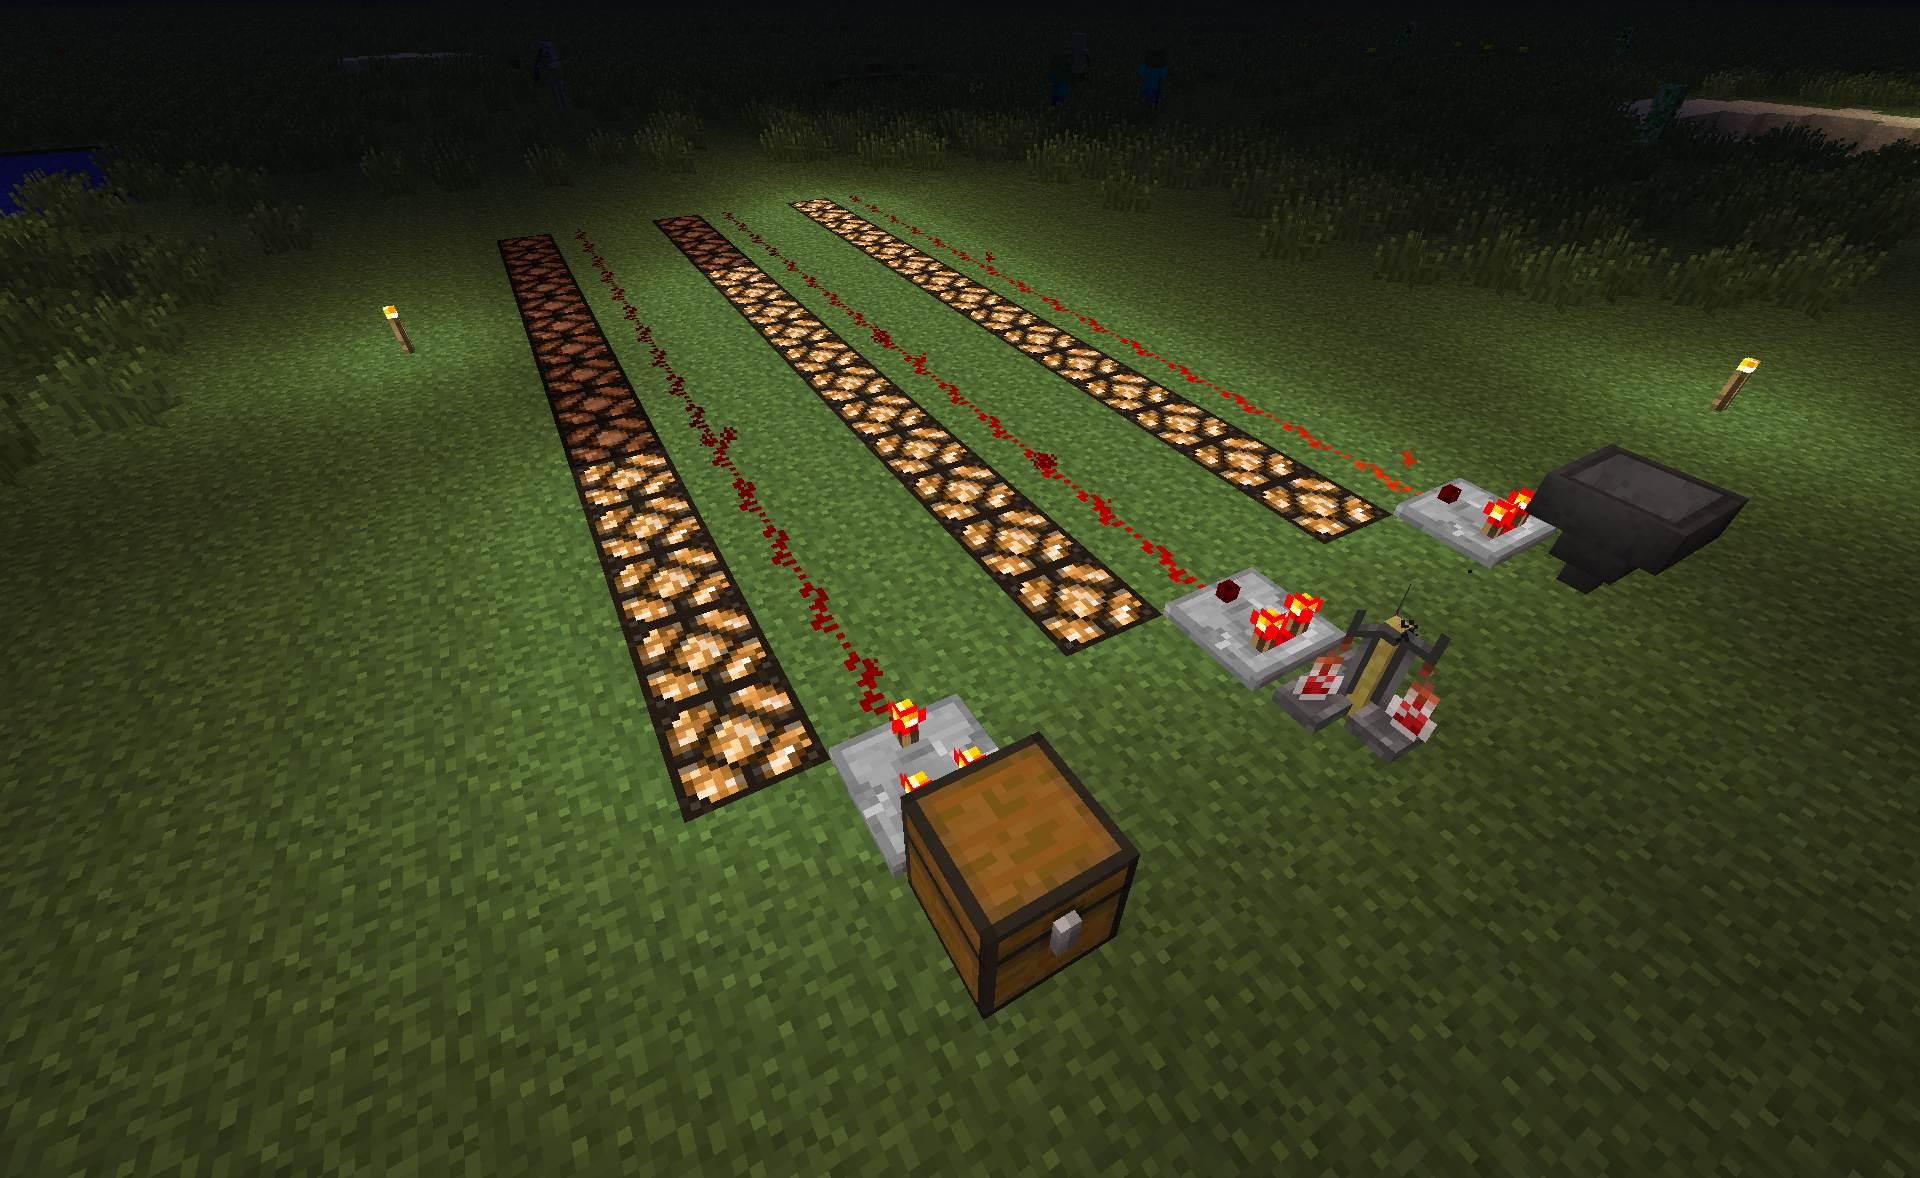 minecraft dernires news sortie de la snapshot 13w01b - Lampadaire Minecraft